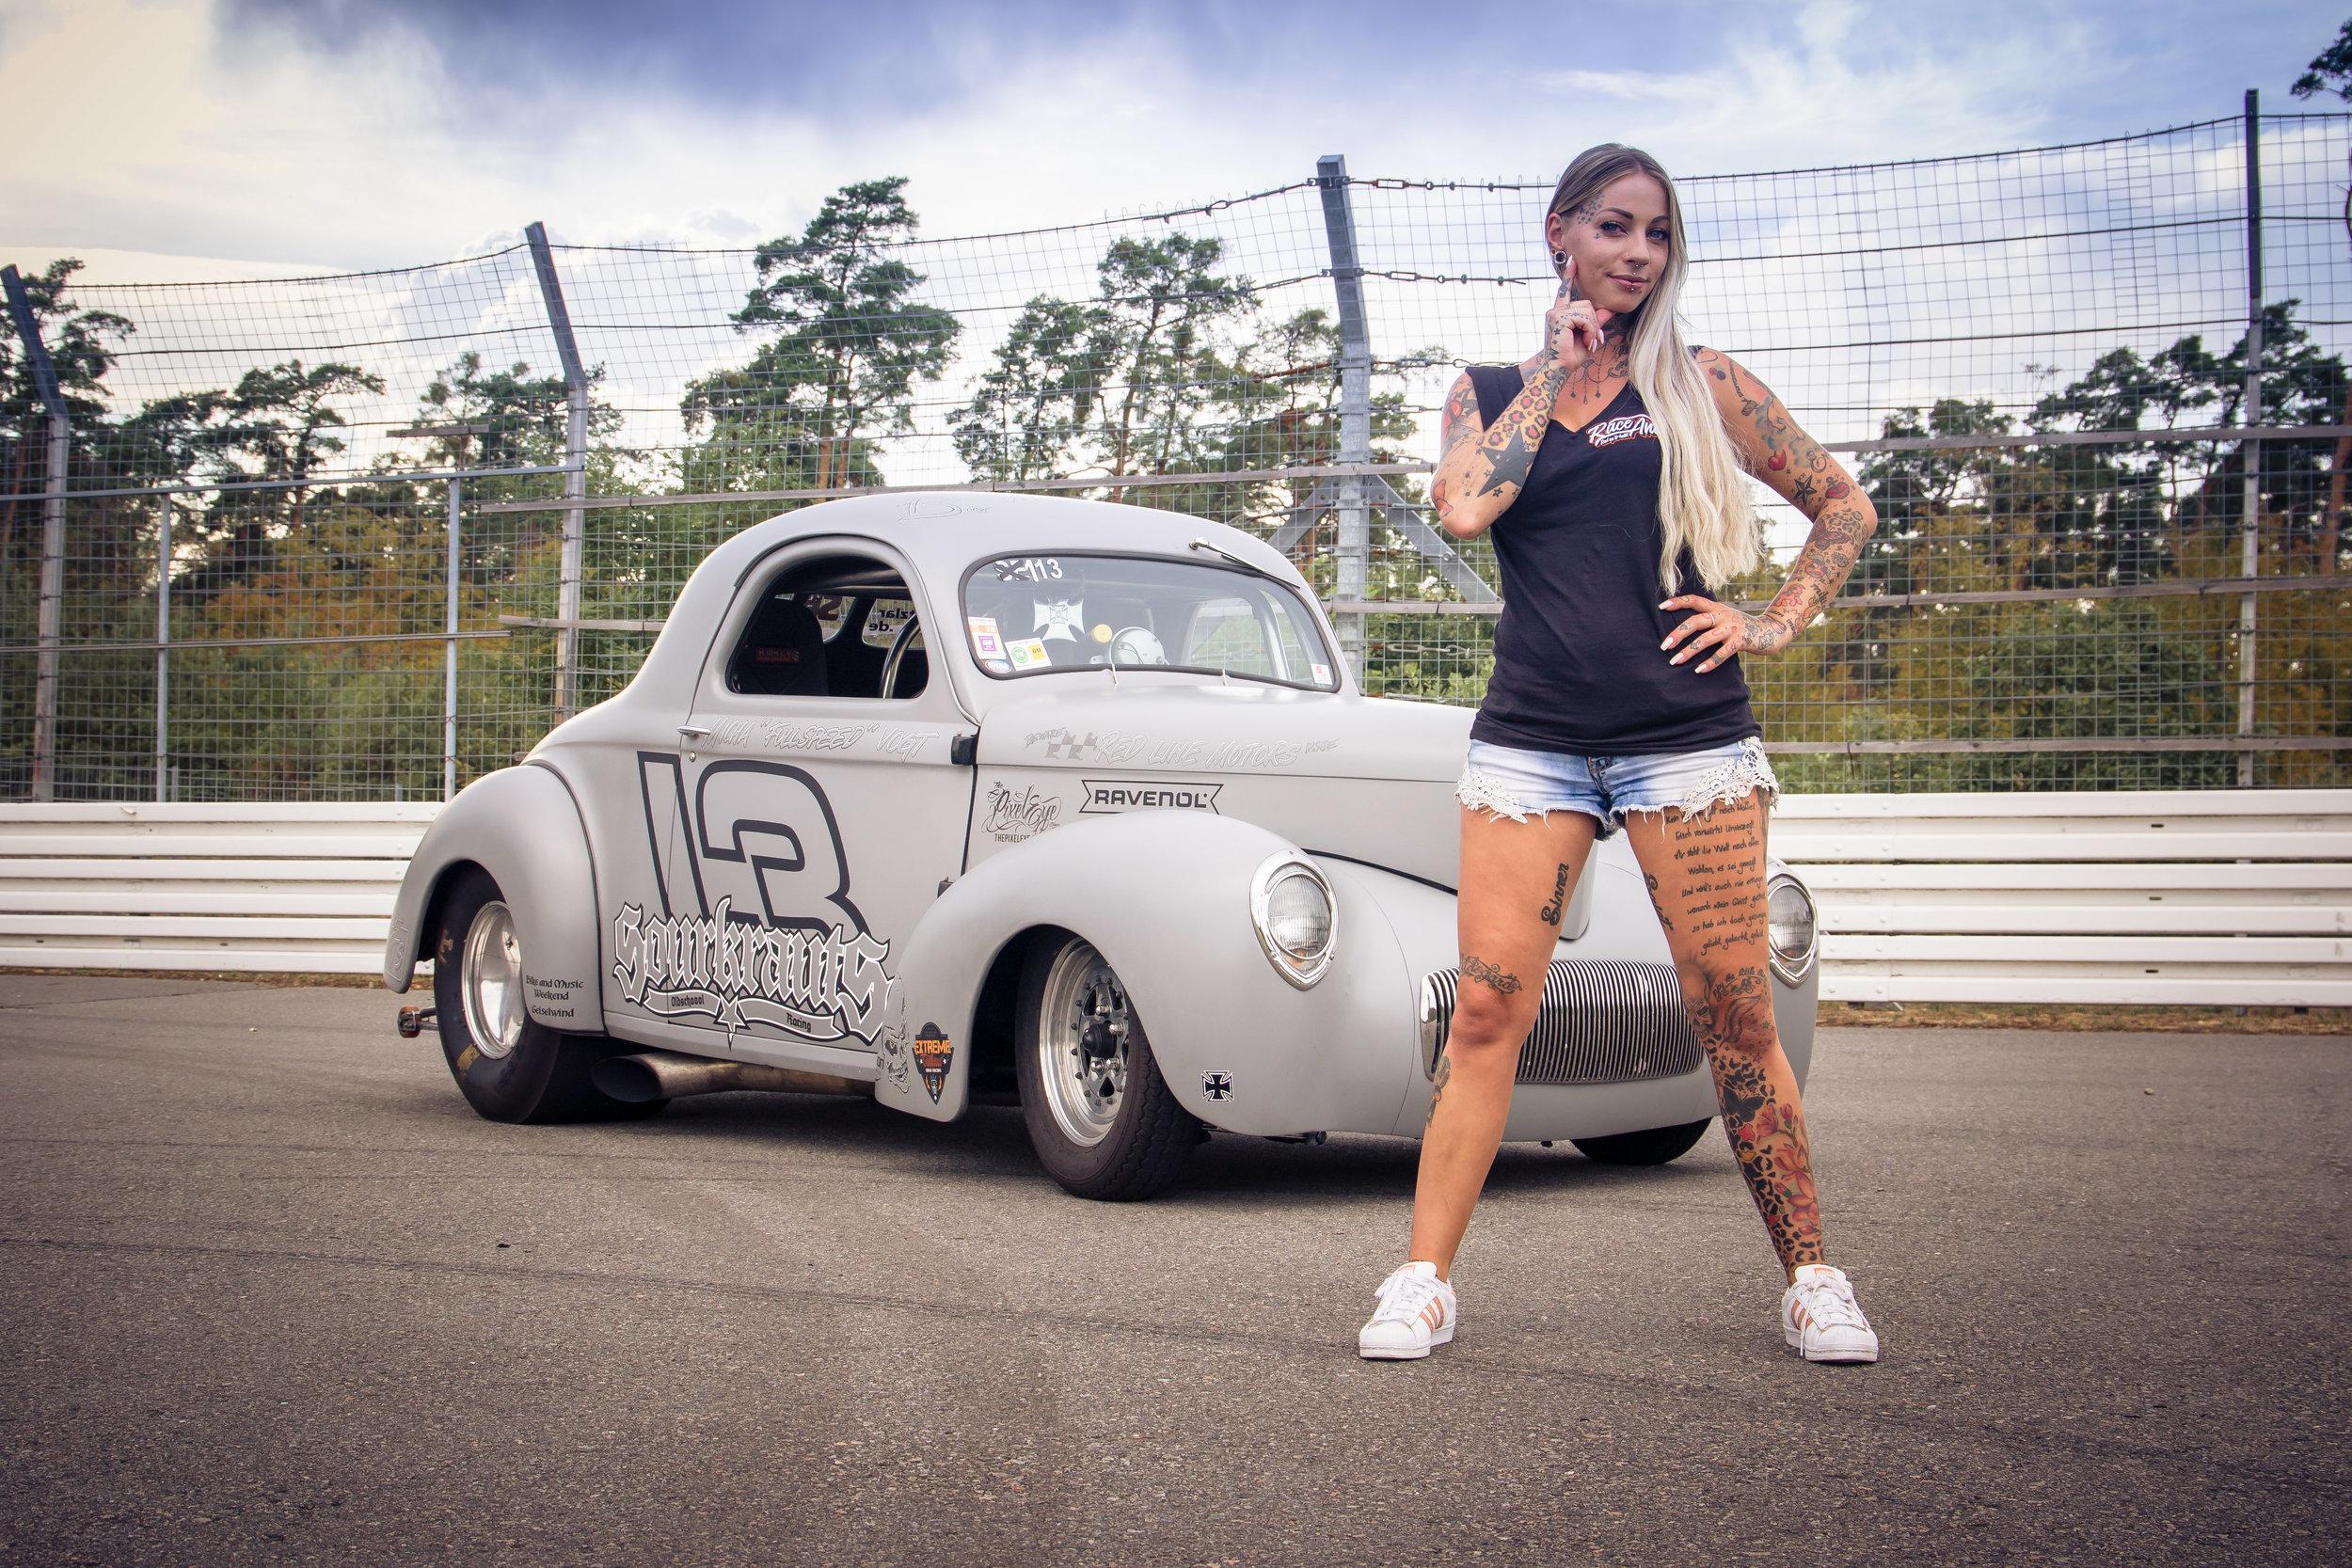 Race Antz NitrolympX 2018-9079.jpg